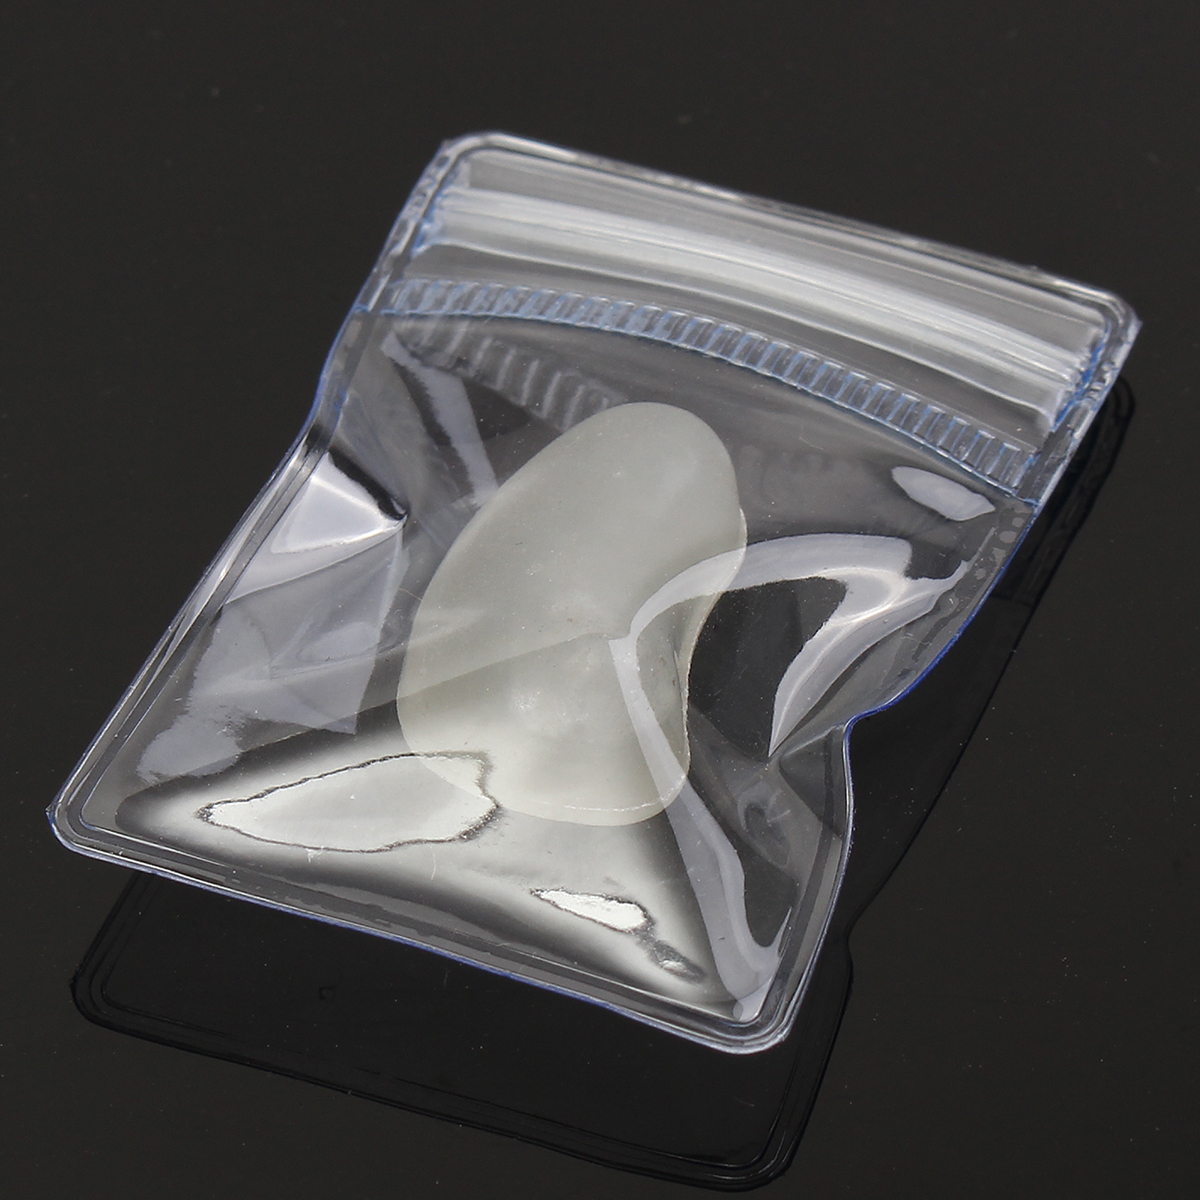 MAYITR Reclosable 50pcs New PVC Jewellery Extra Thick Mini Ziplock Grip Seal Bags Plastic small zipper Storage Bags